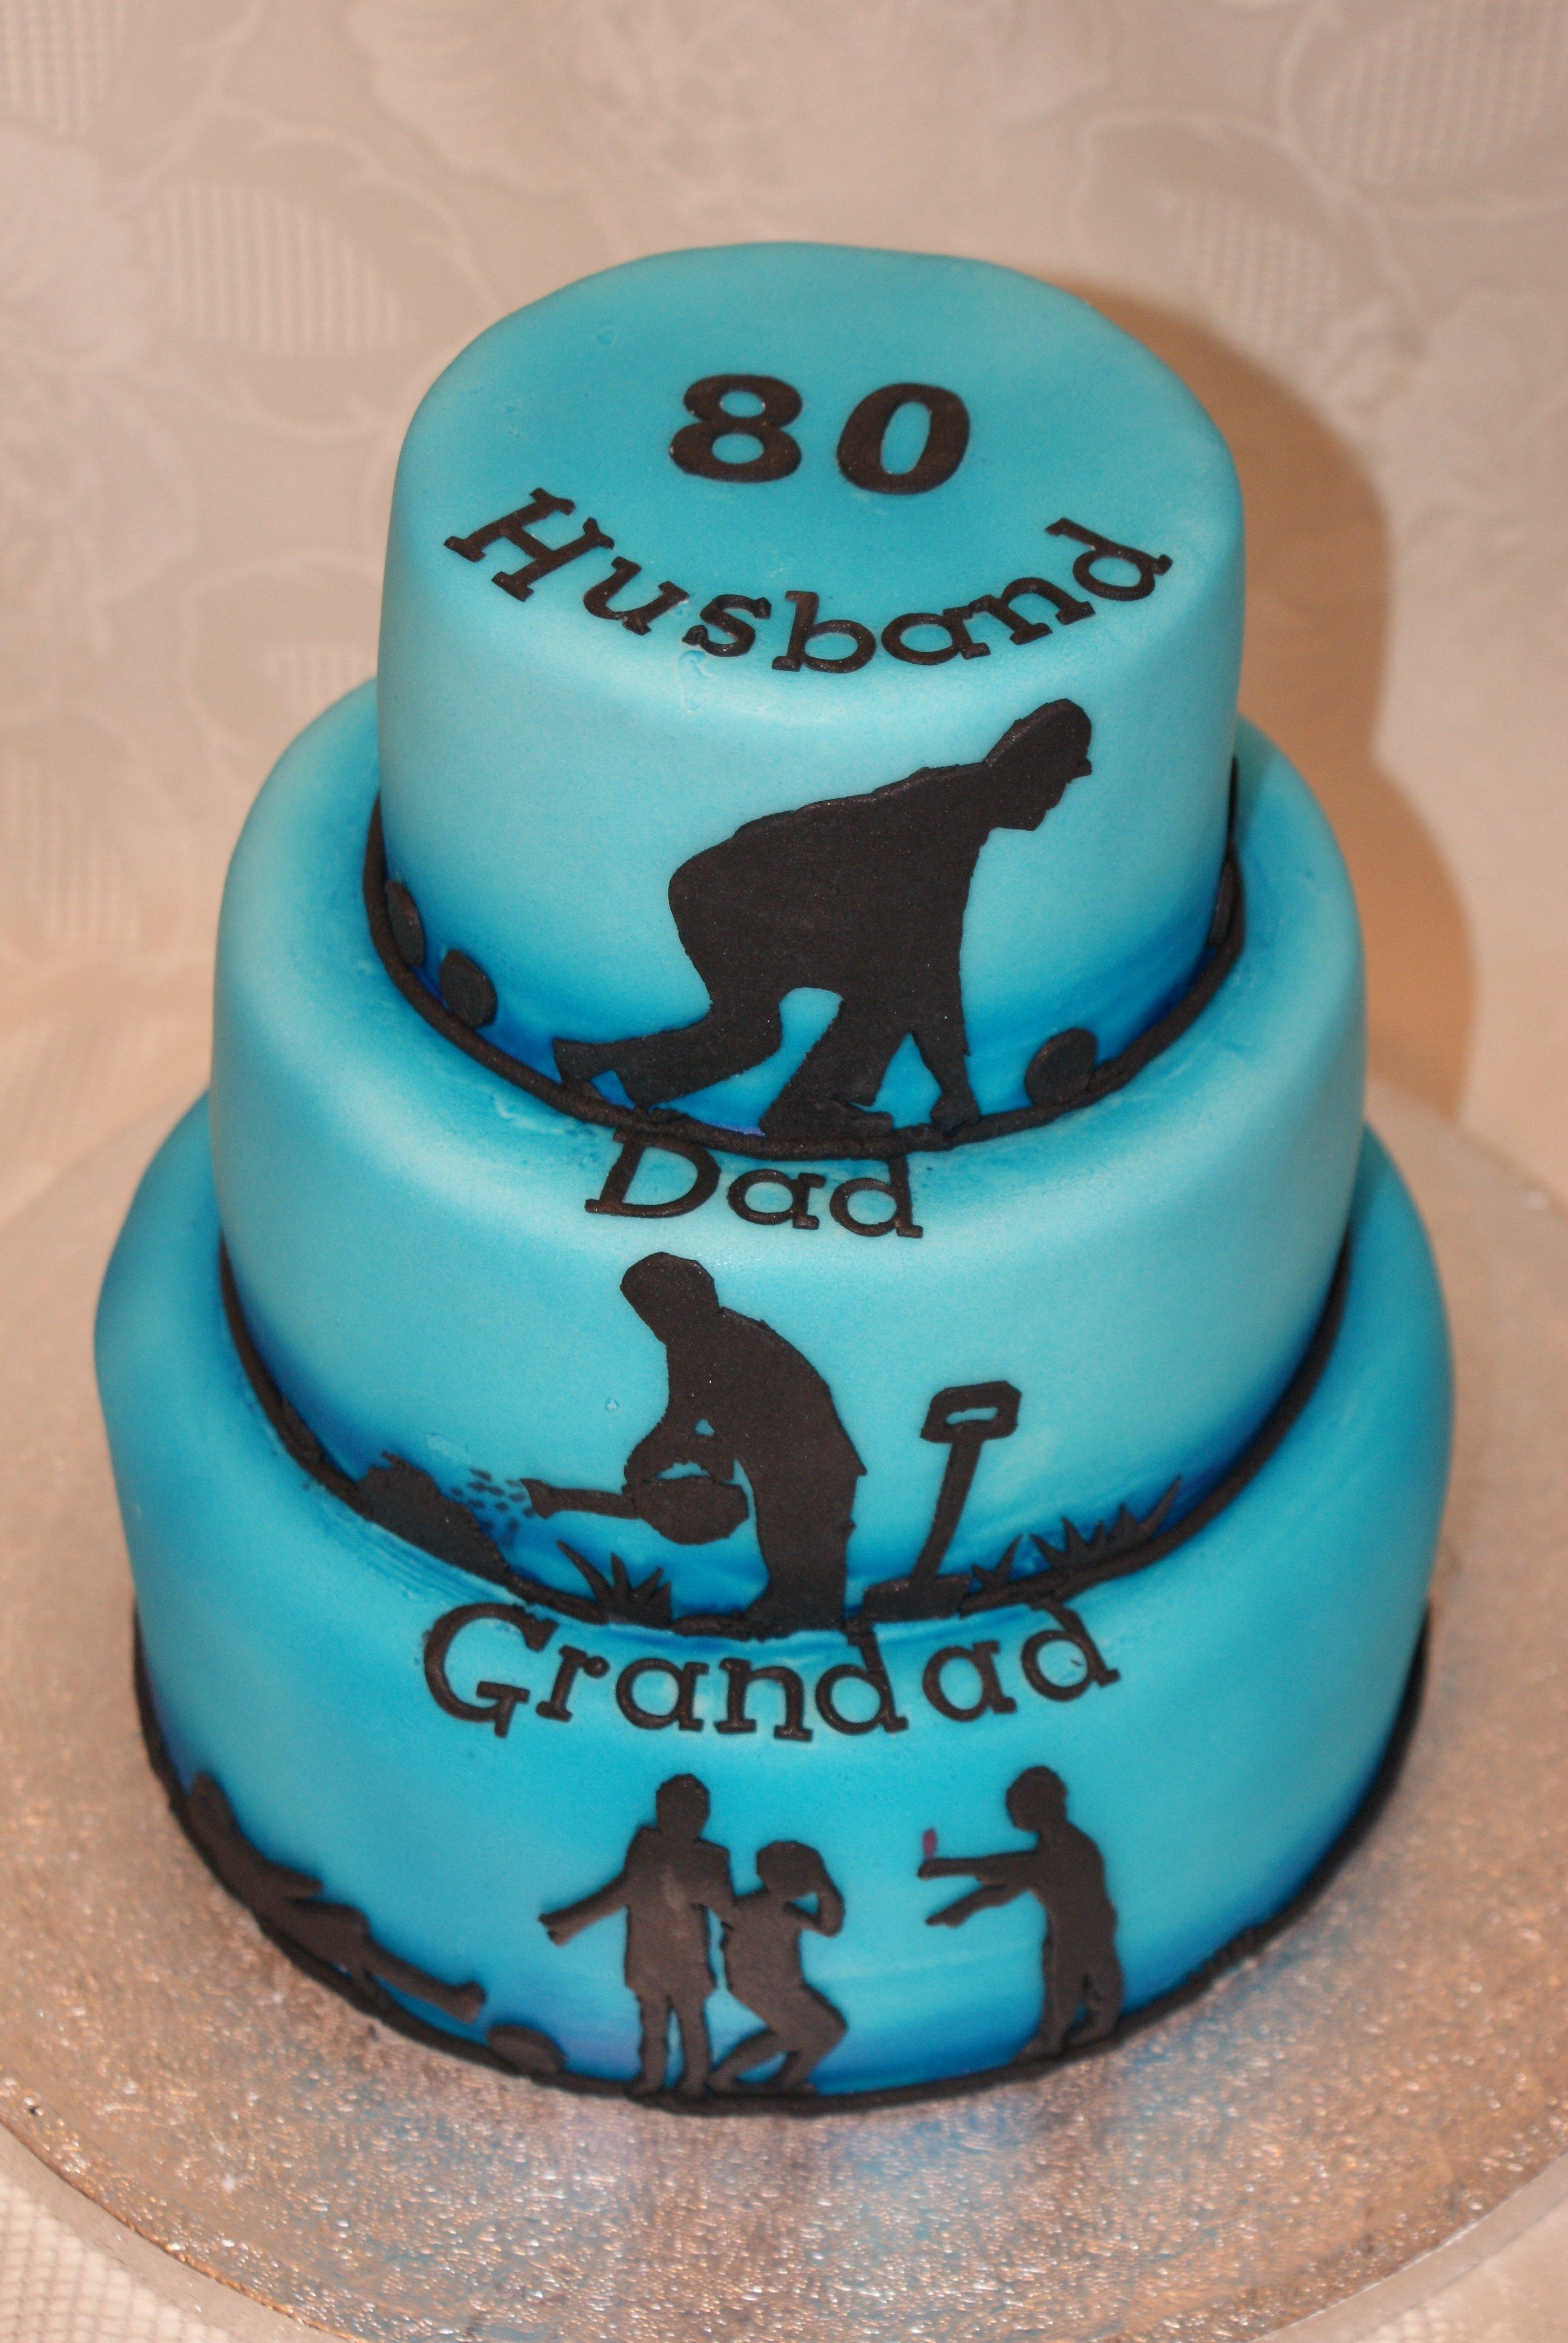 10 Nice 80Th Birthday Ideas For Dad 80th birthday cake husband dad grandad tiered cake with lawn bowls